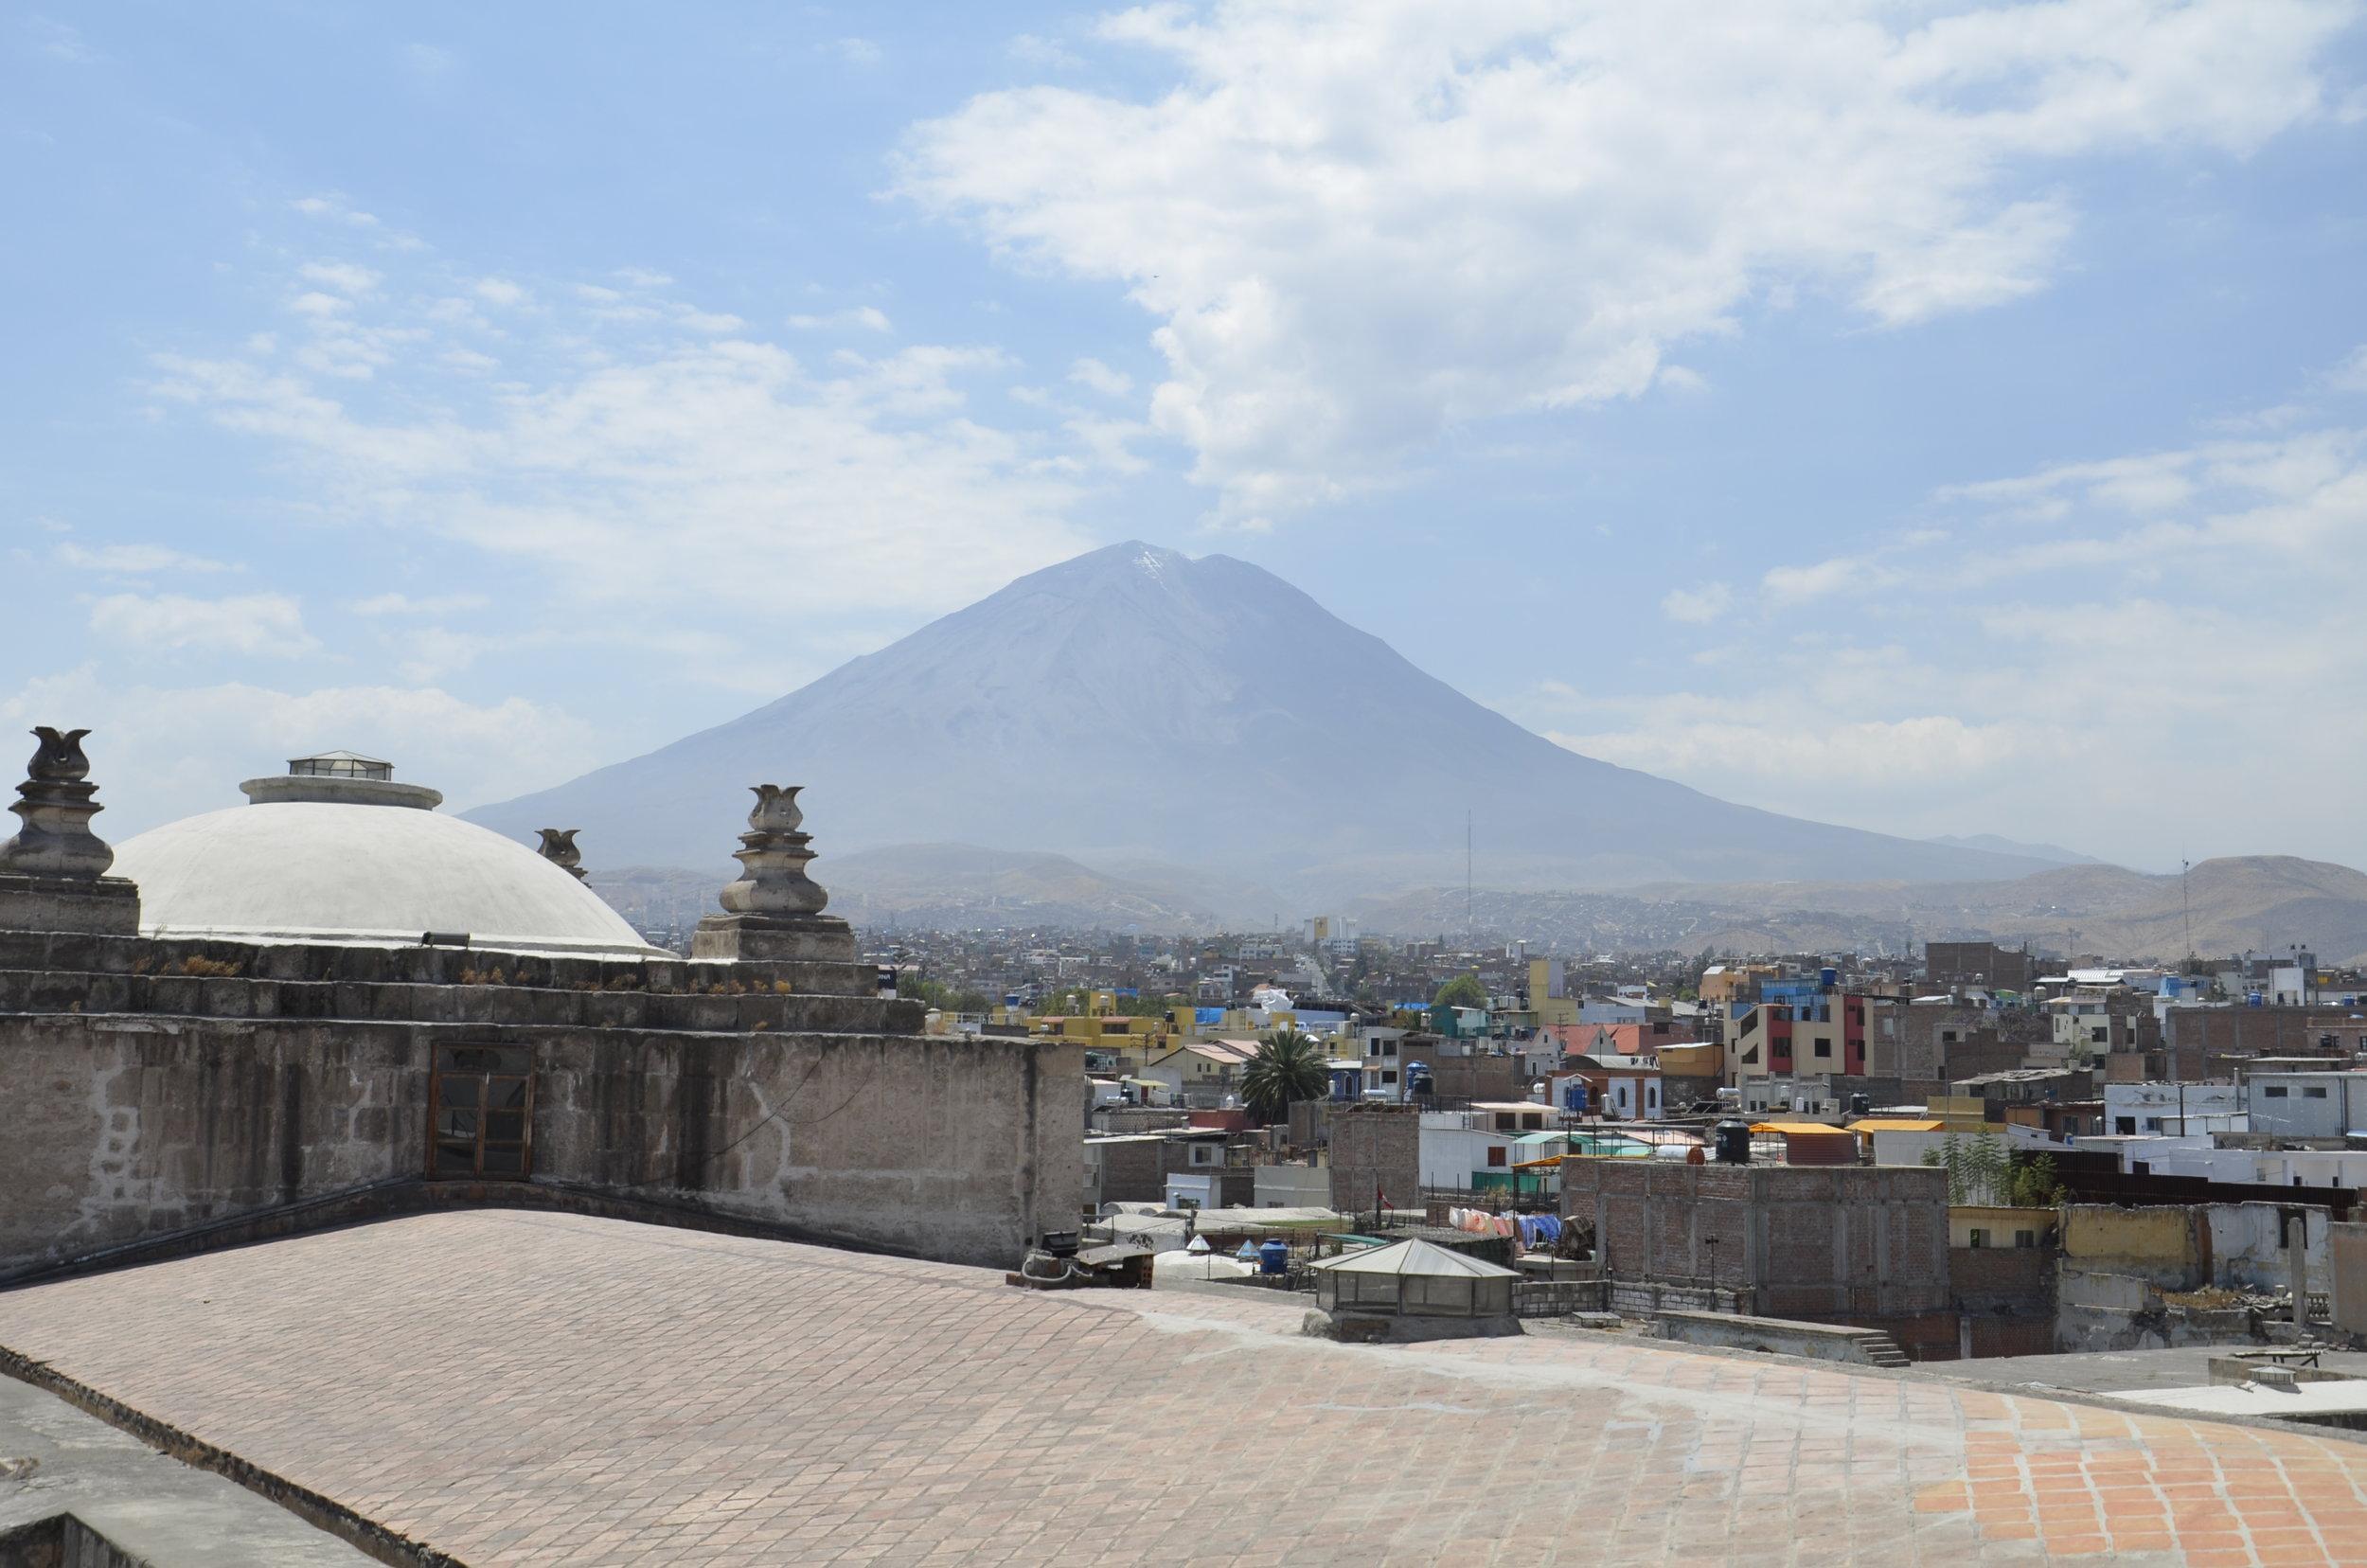 El Misti, the closest volcano to Arequipa